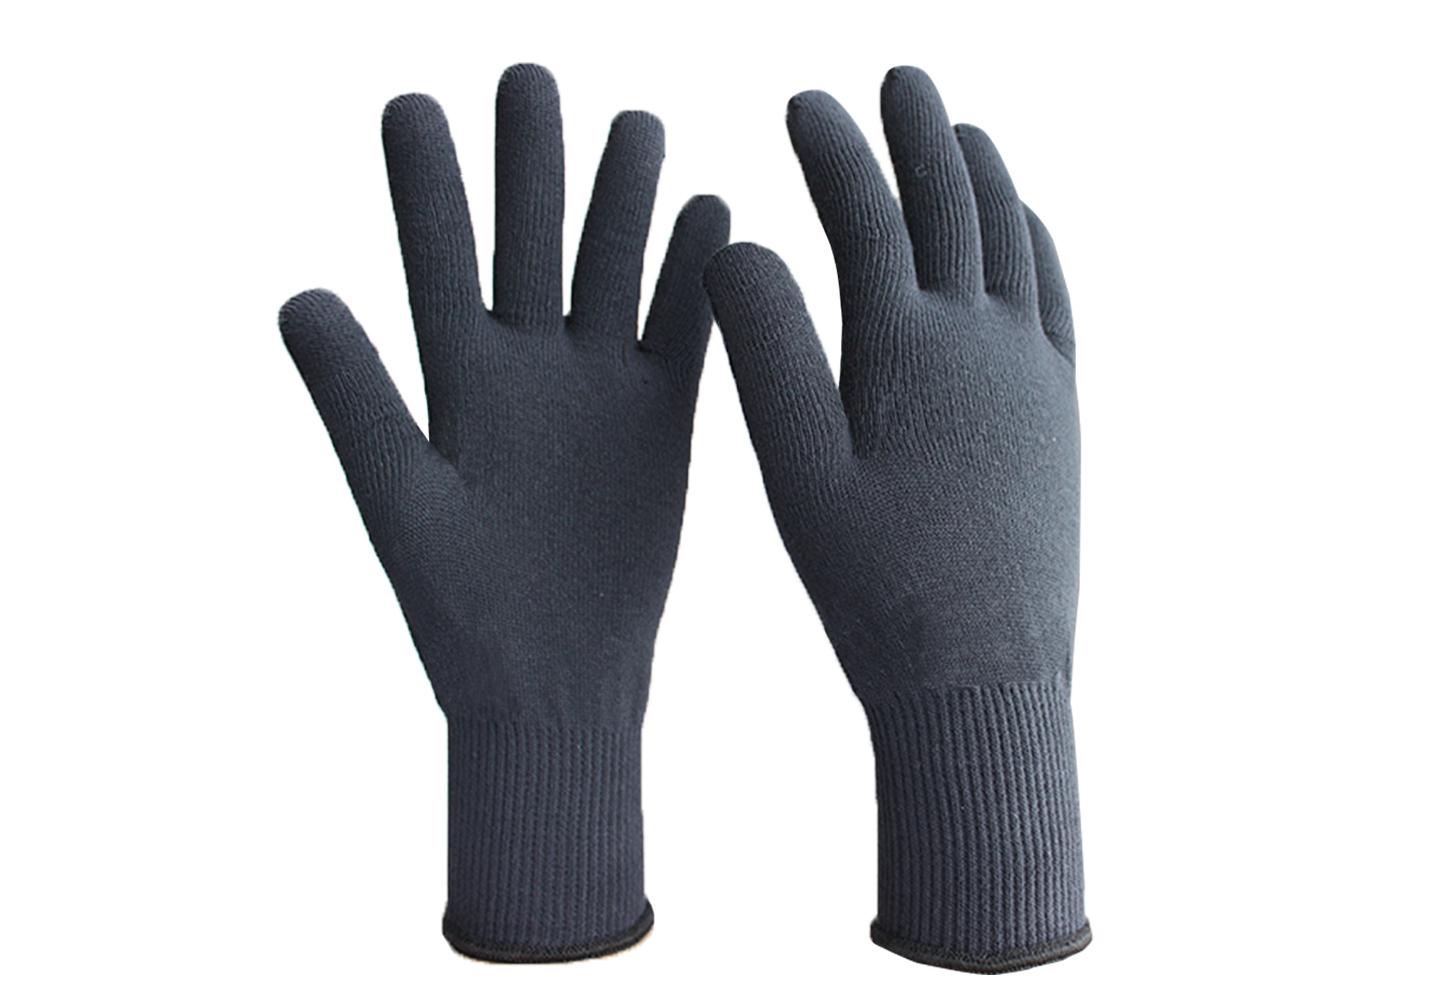 13G Thermolite Yarn Touch Screen Glove/MWG-002-B